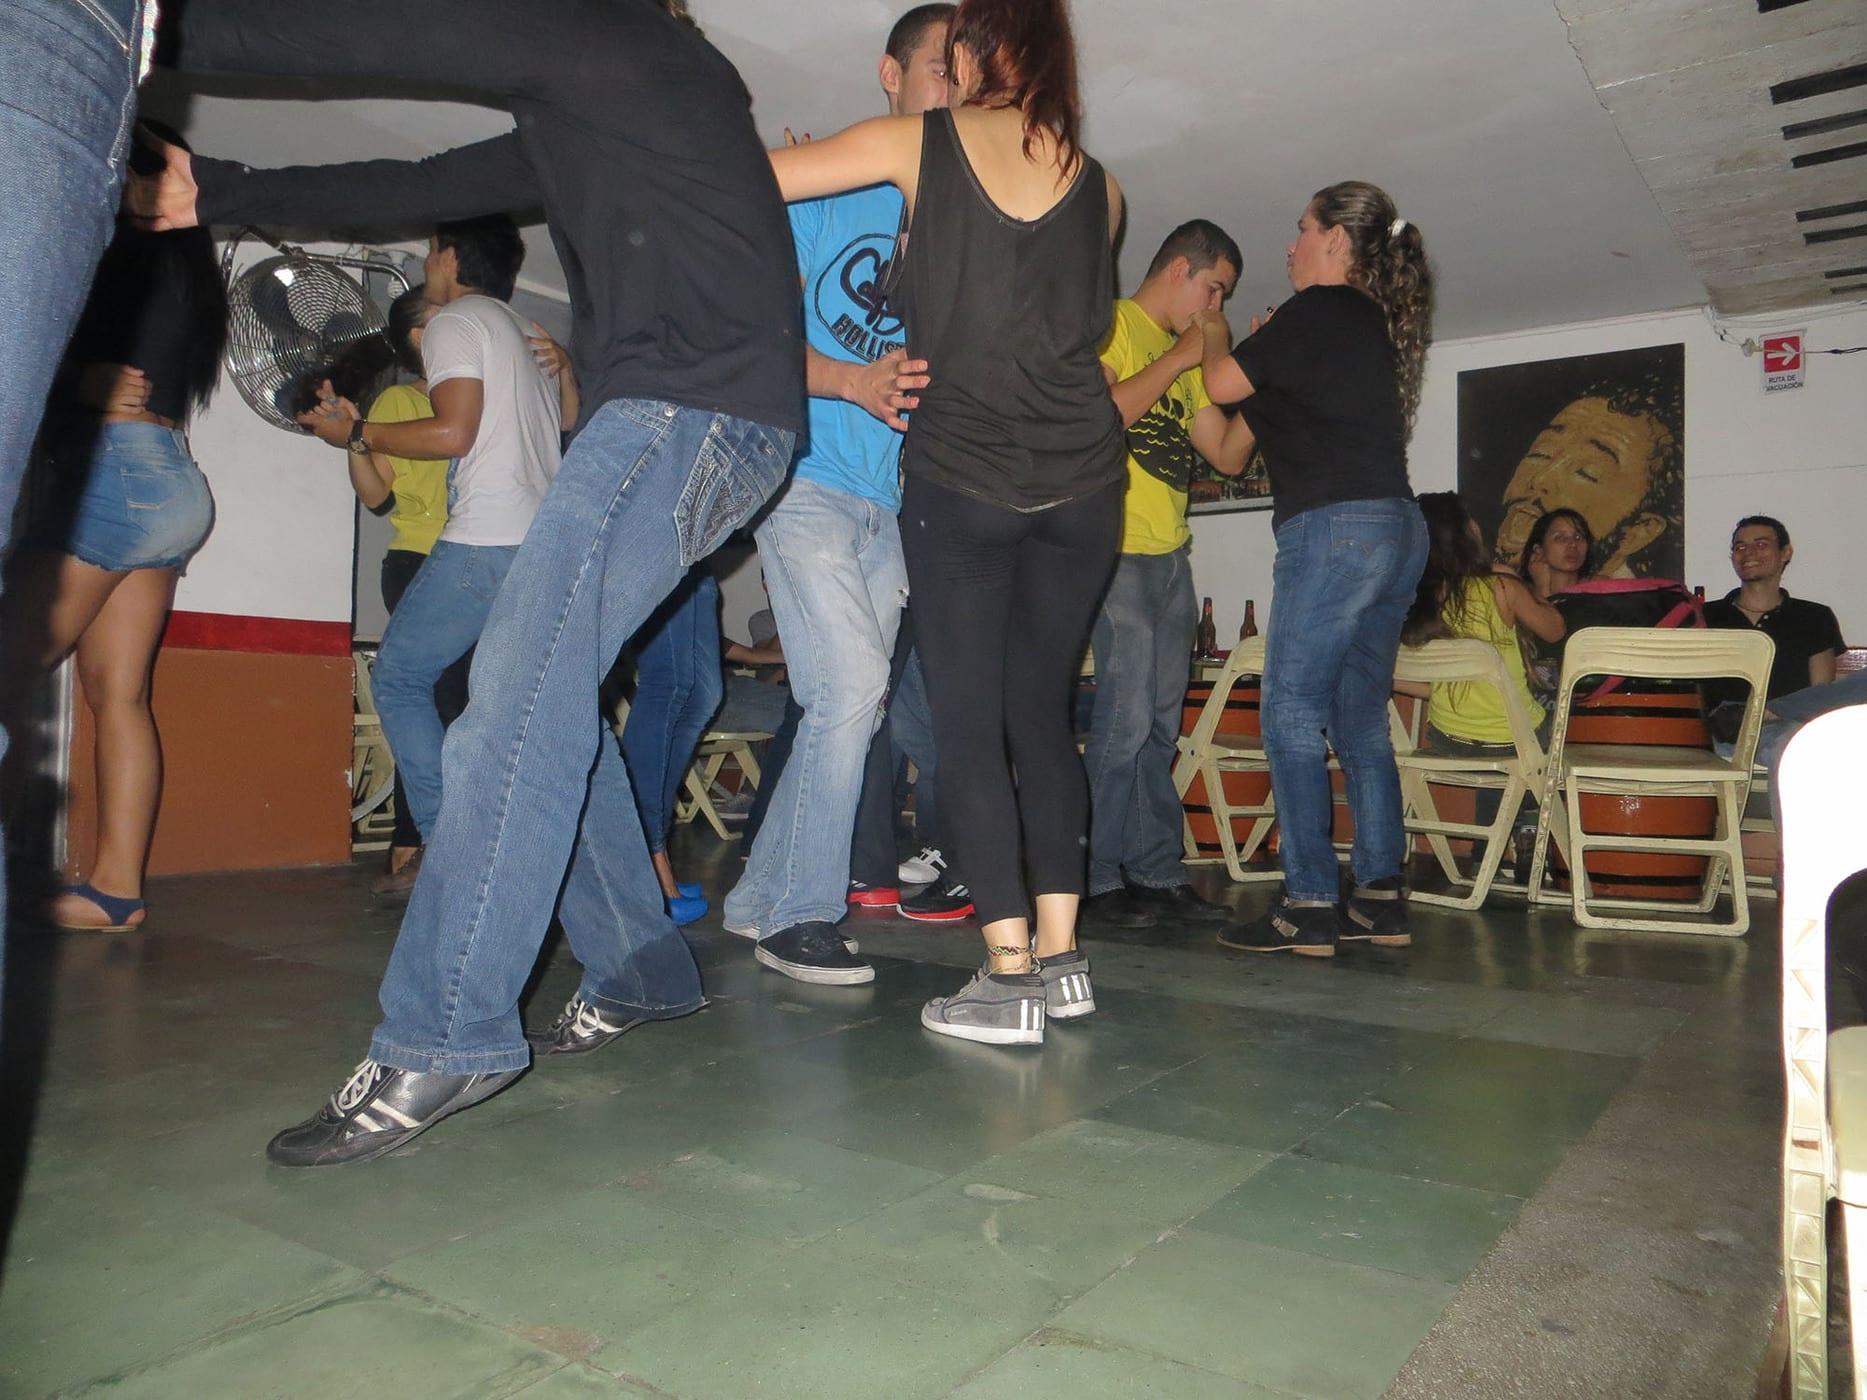 Salsa dancing in Medellin, Colombia